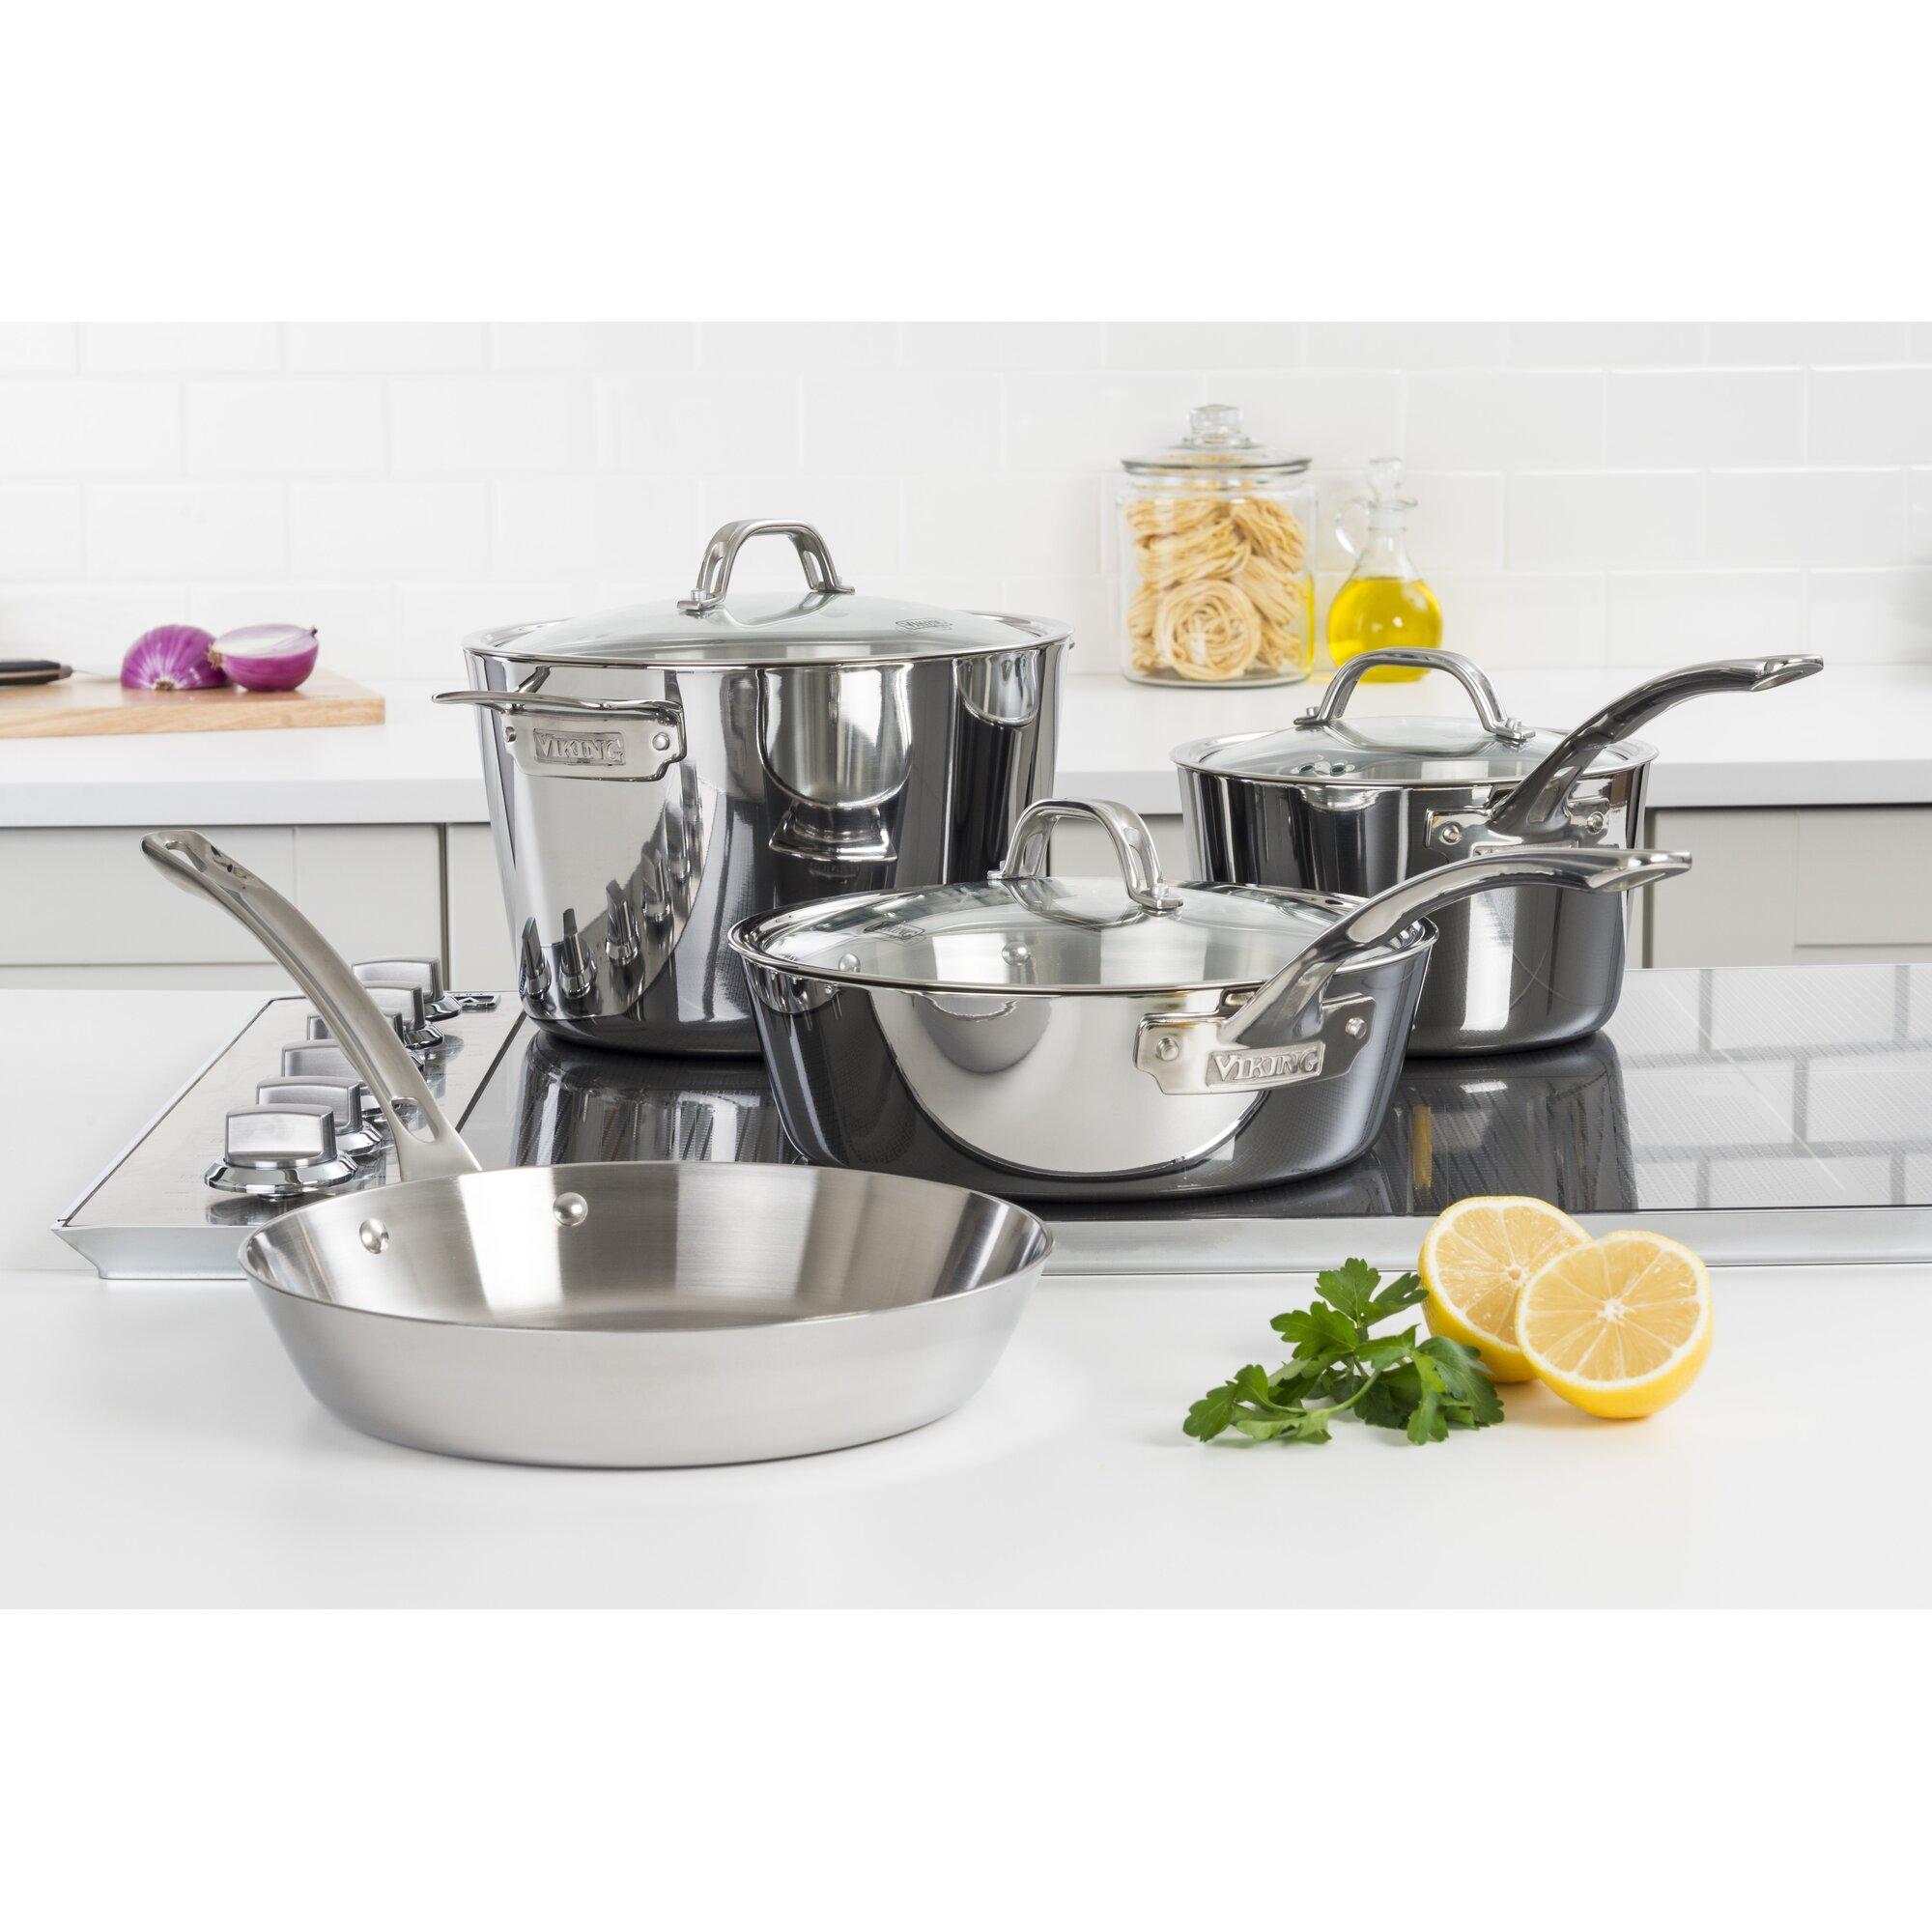 Viking Contemporary 7-Piece Cookware Set & Reviews | Wayfair